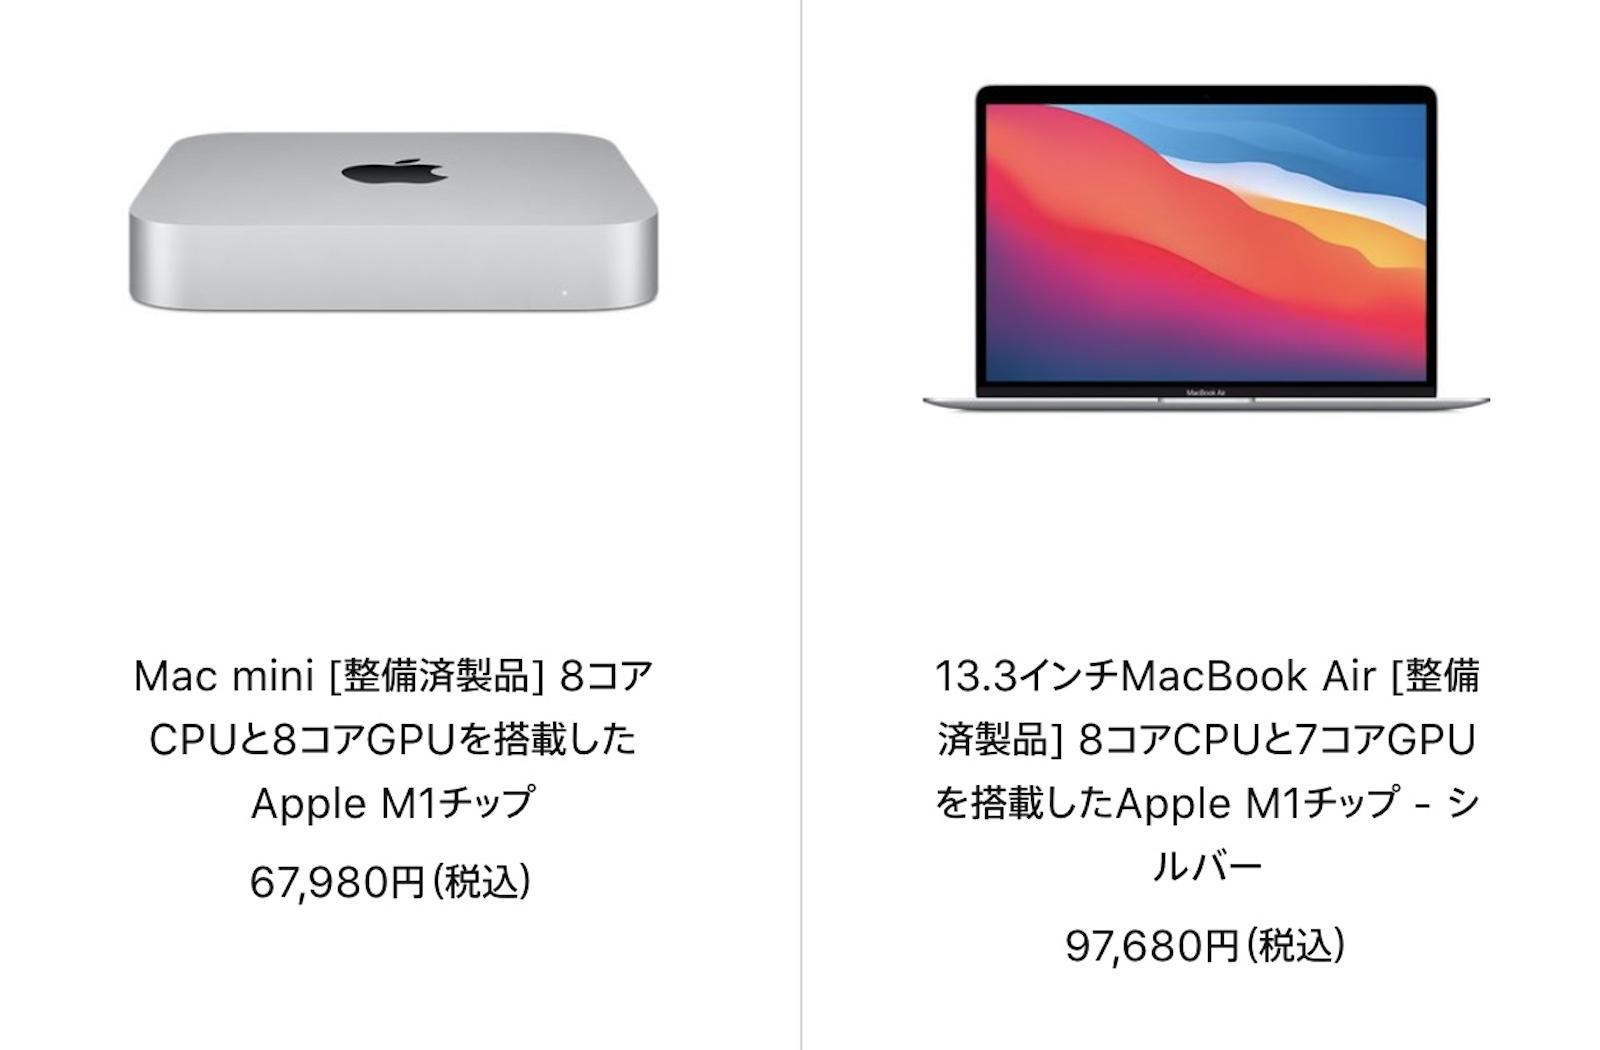 M1 macmini and macbookair refurbished 20210616